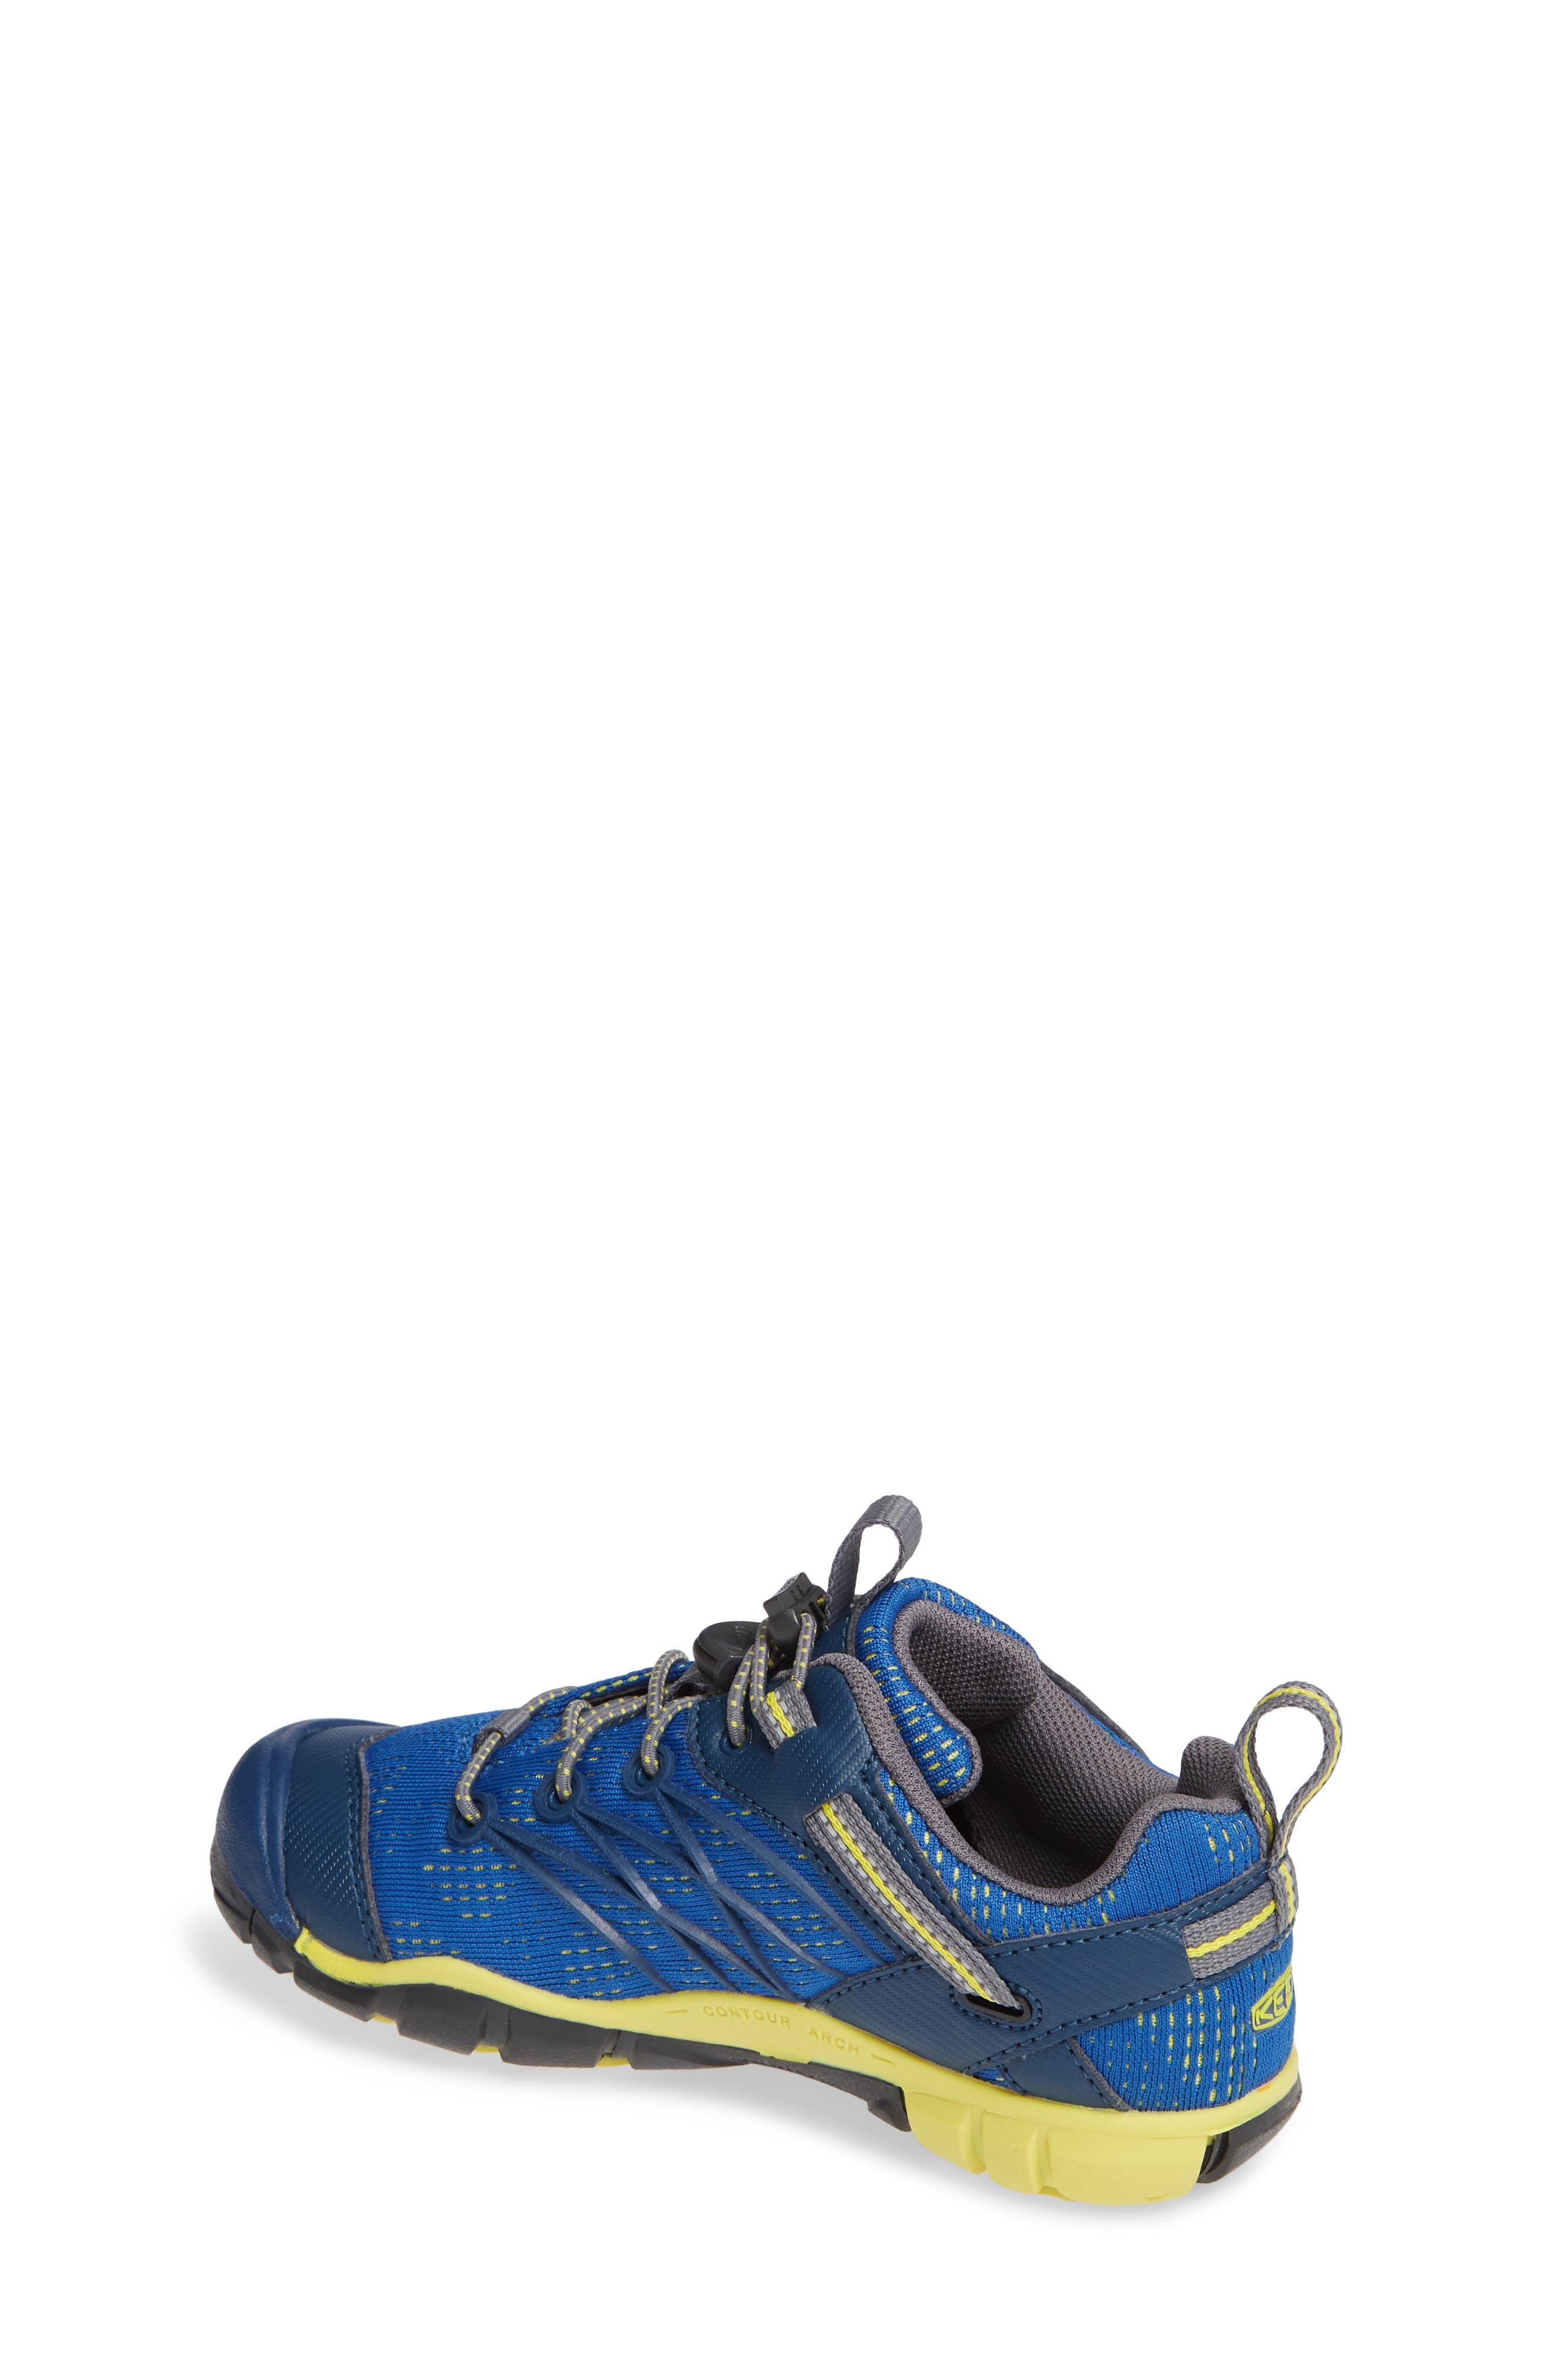 KEEN, 'Chandler CNX' Water Friendly Sneaker, Alternate thumbnail 2, color, BLUE OPAL/ BLUE